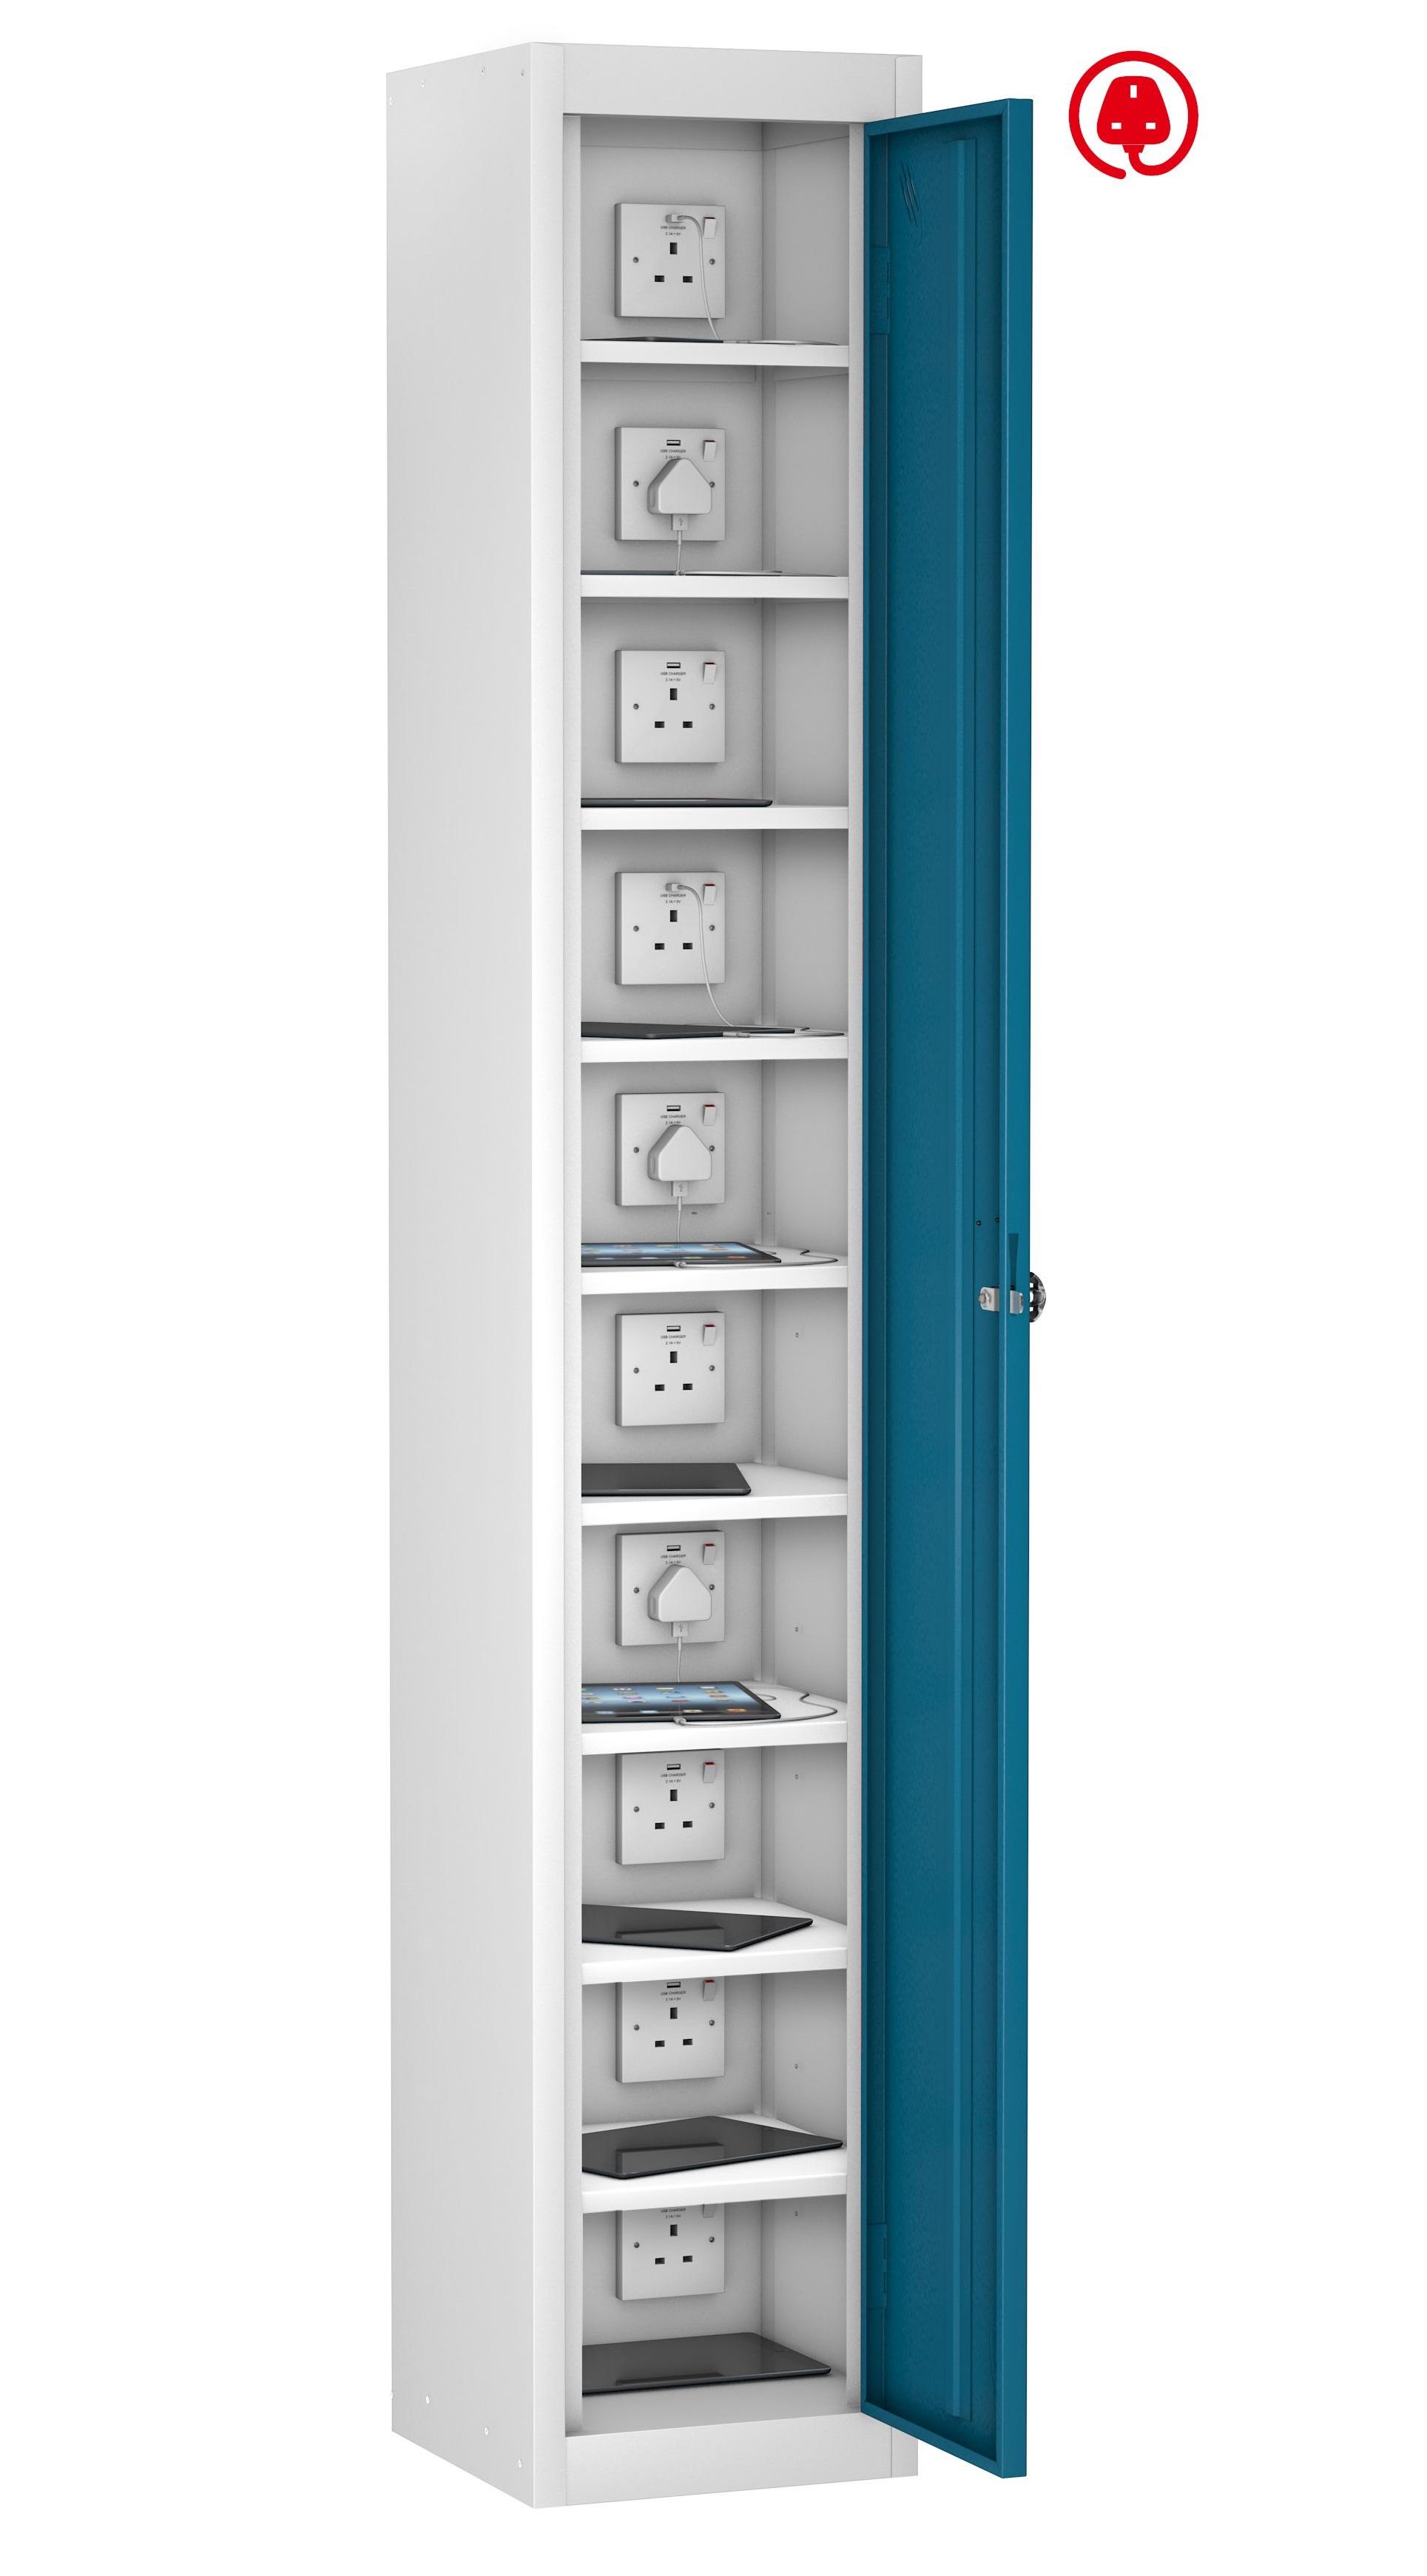 Mobile Phone Locker Single Door 10 Shelf Charging